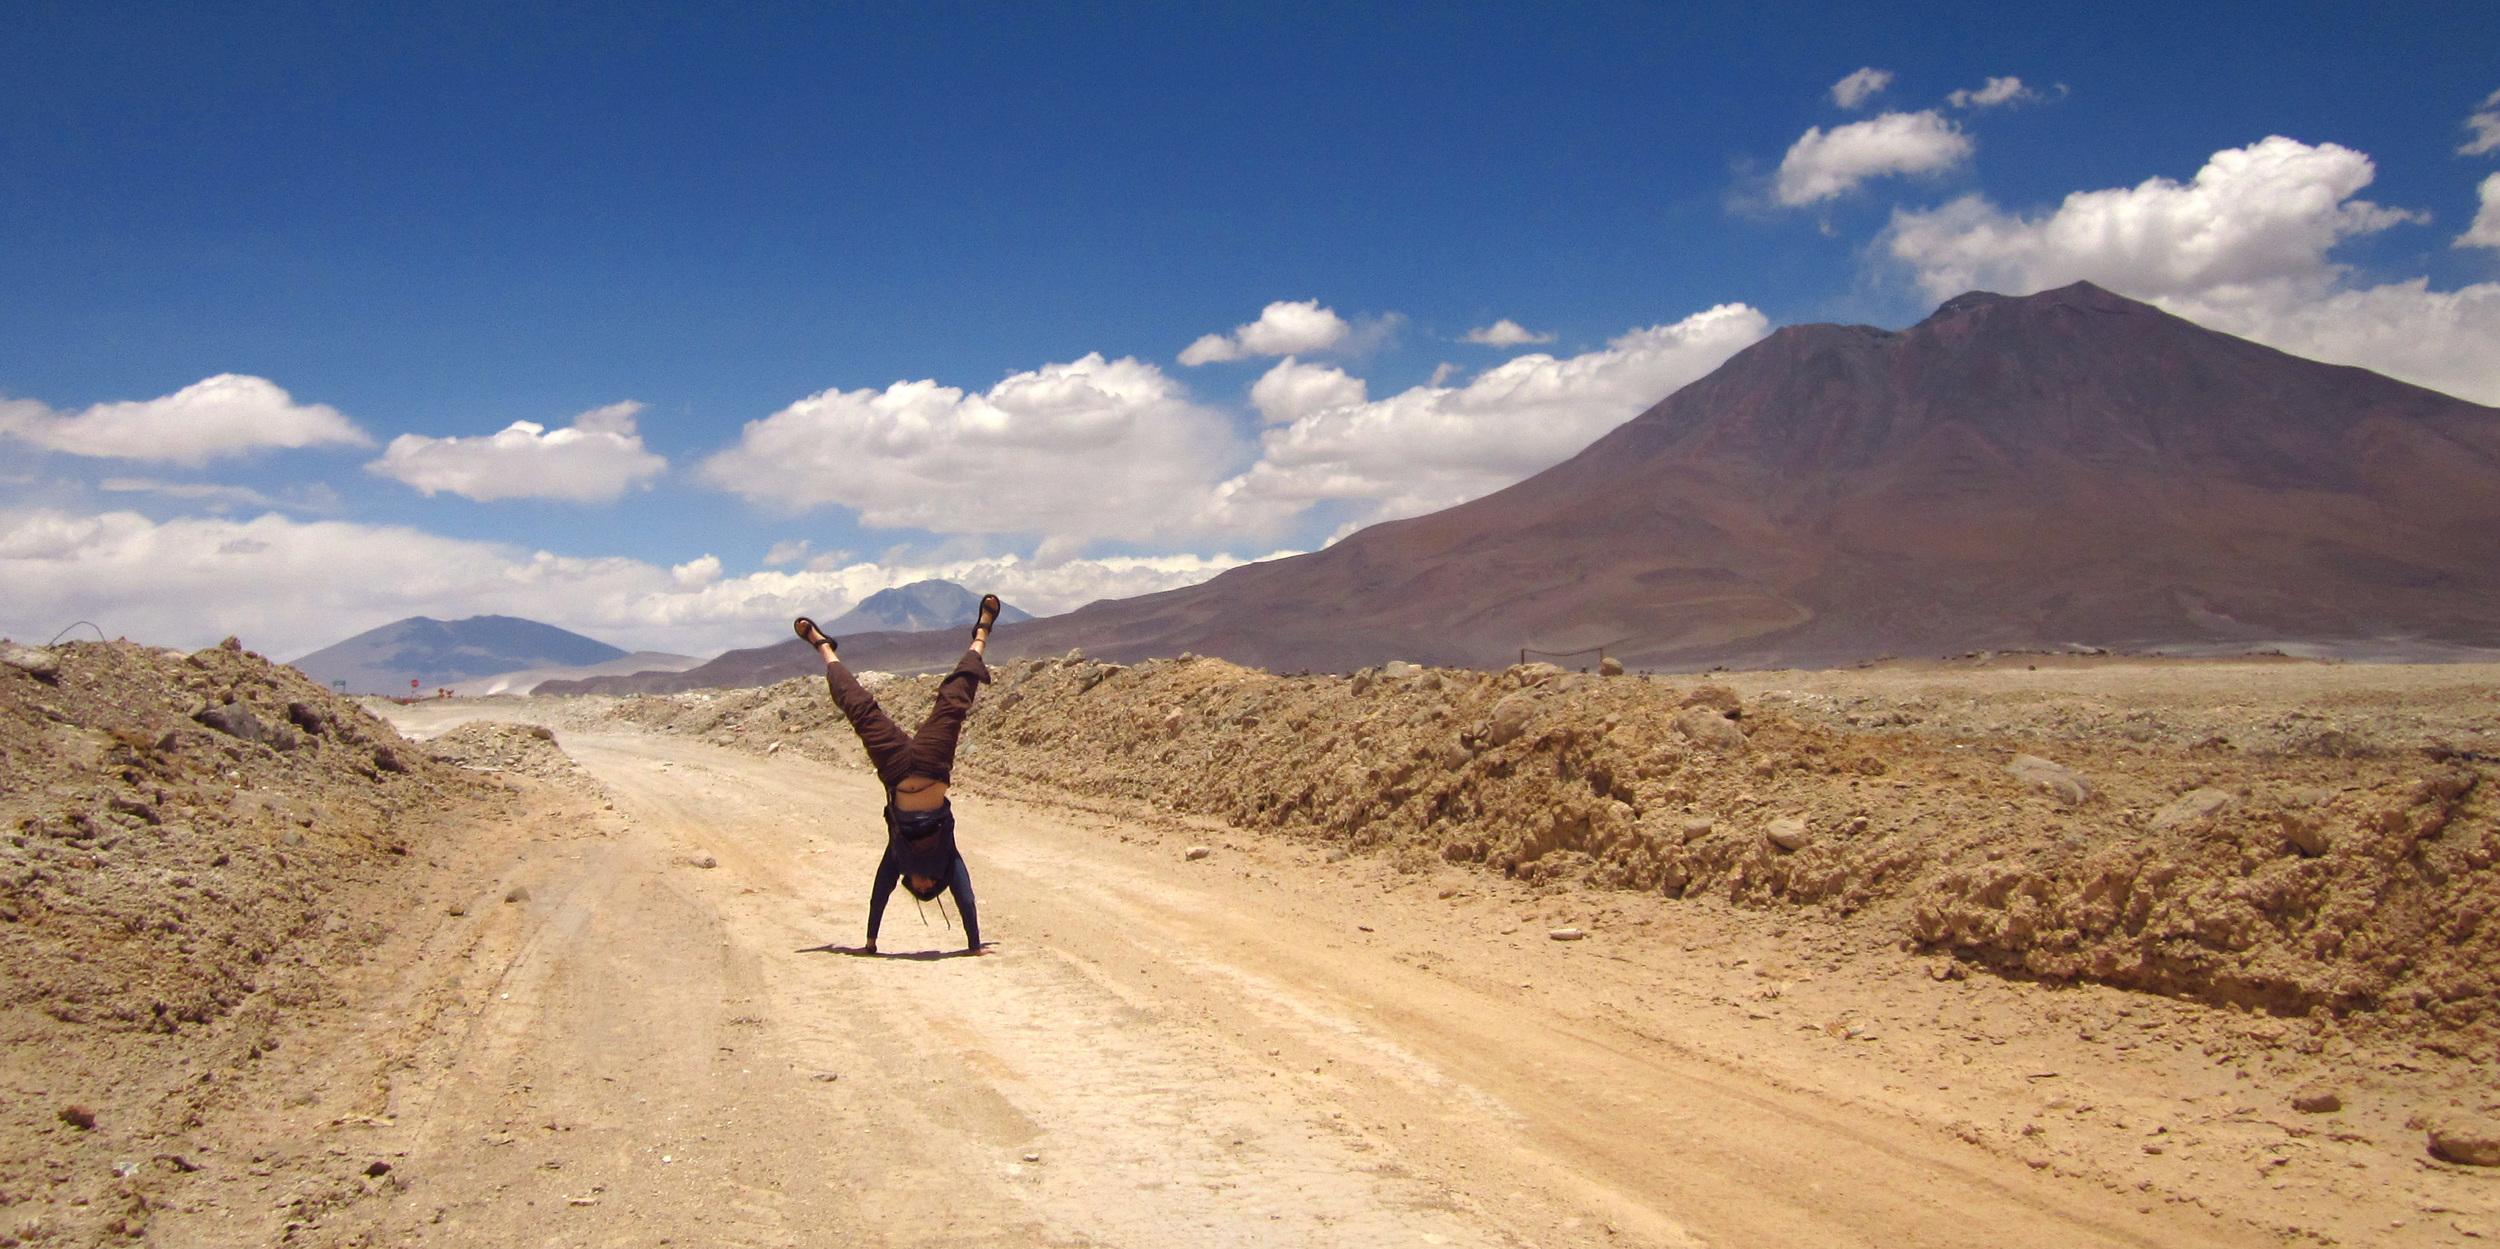 Bolivia 2012, Handstand on 4600m